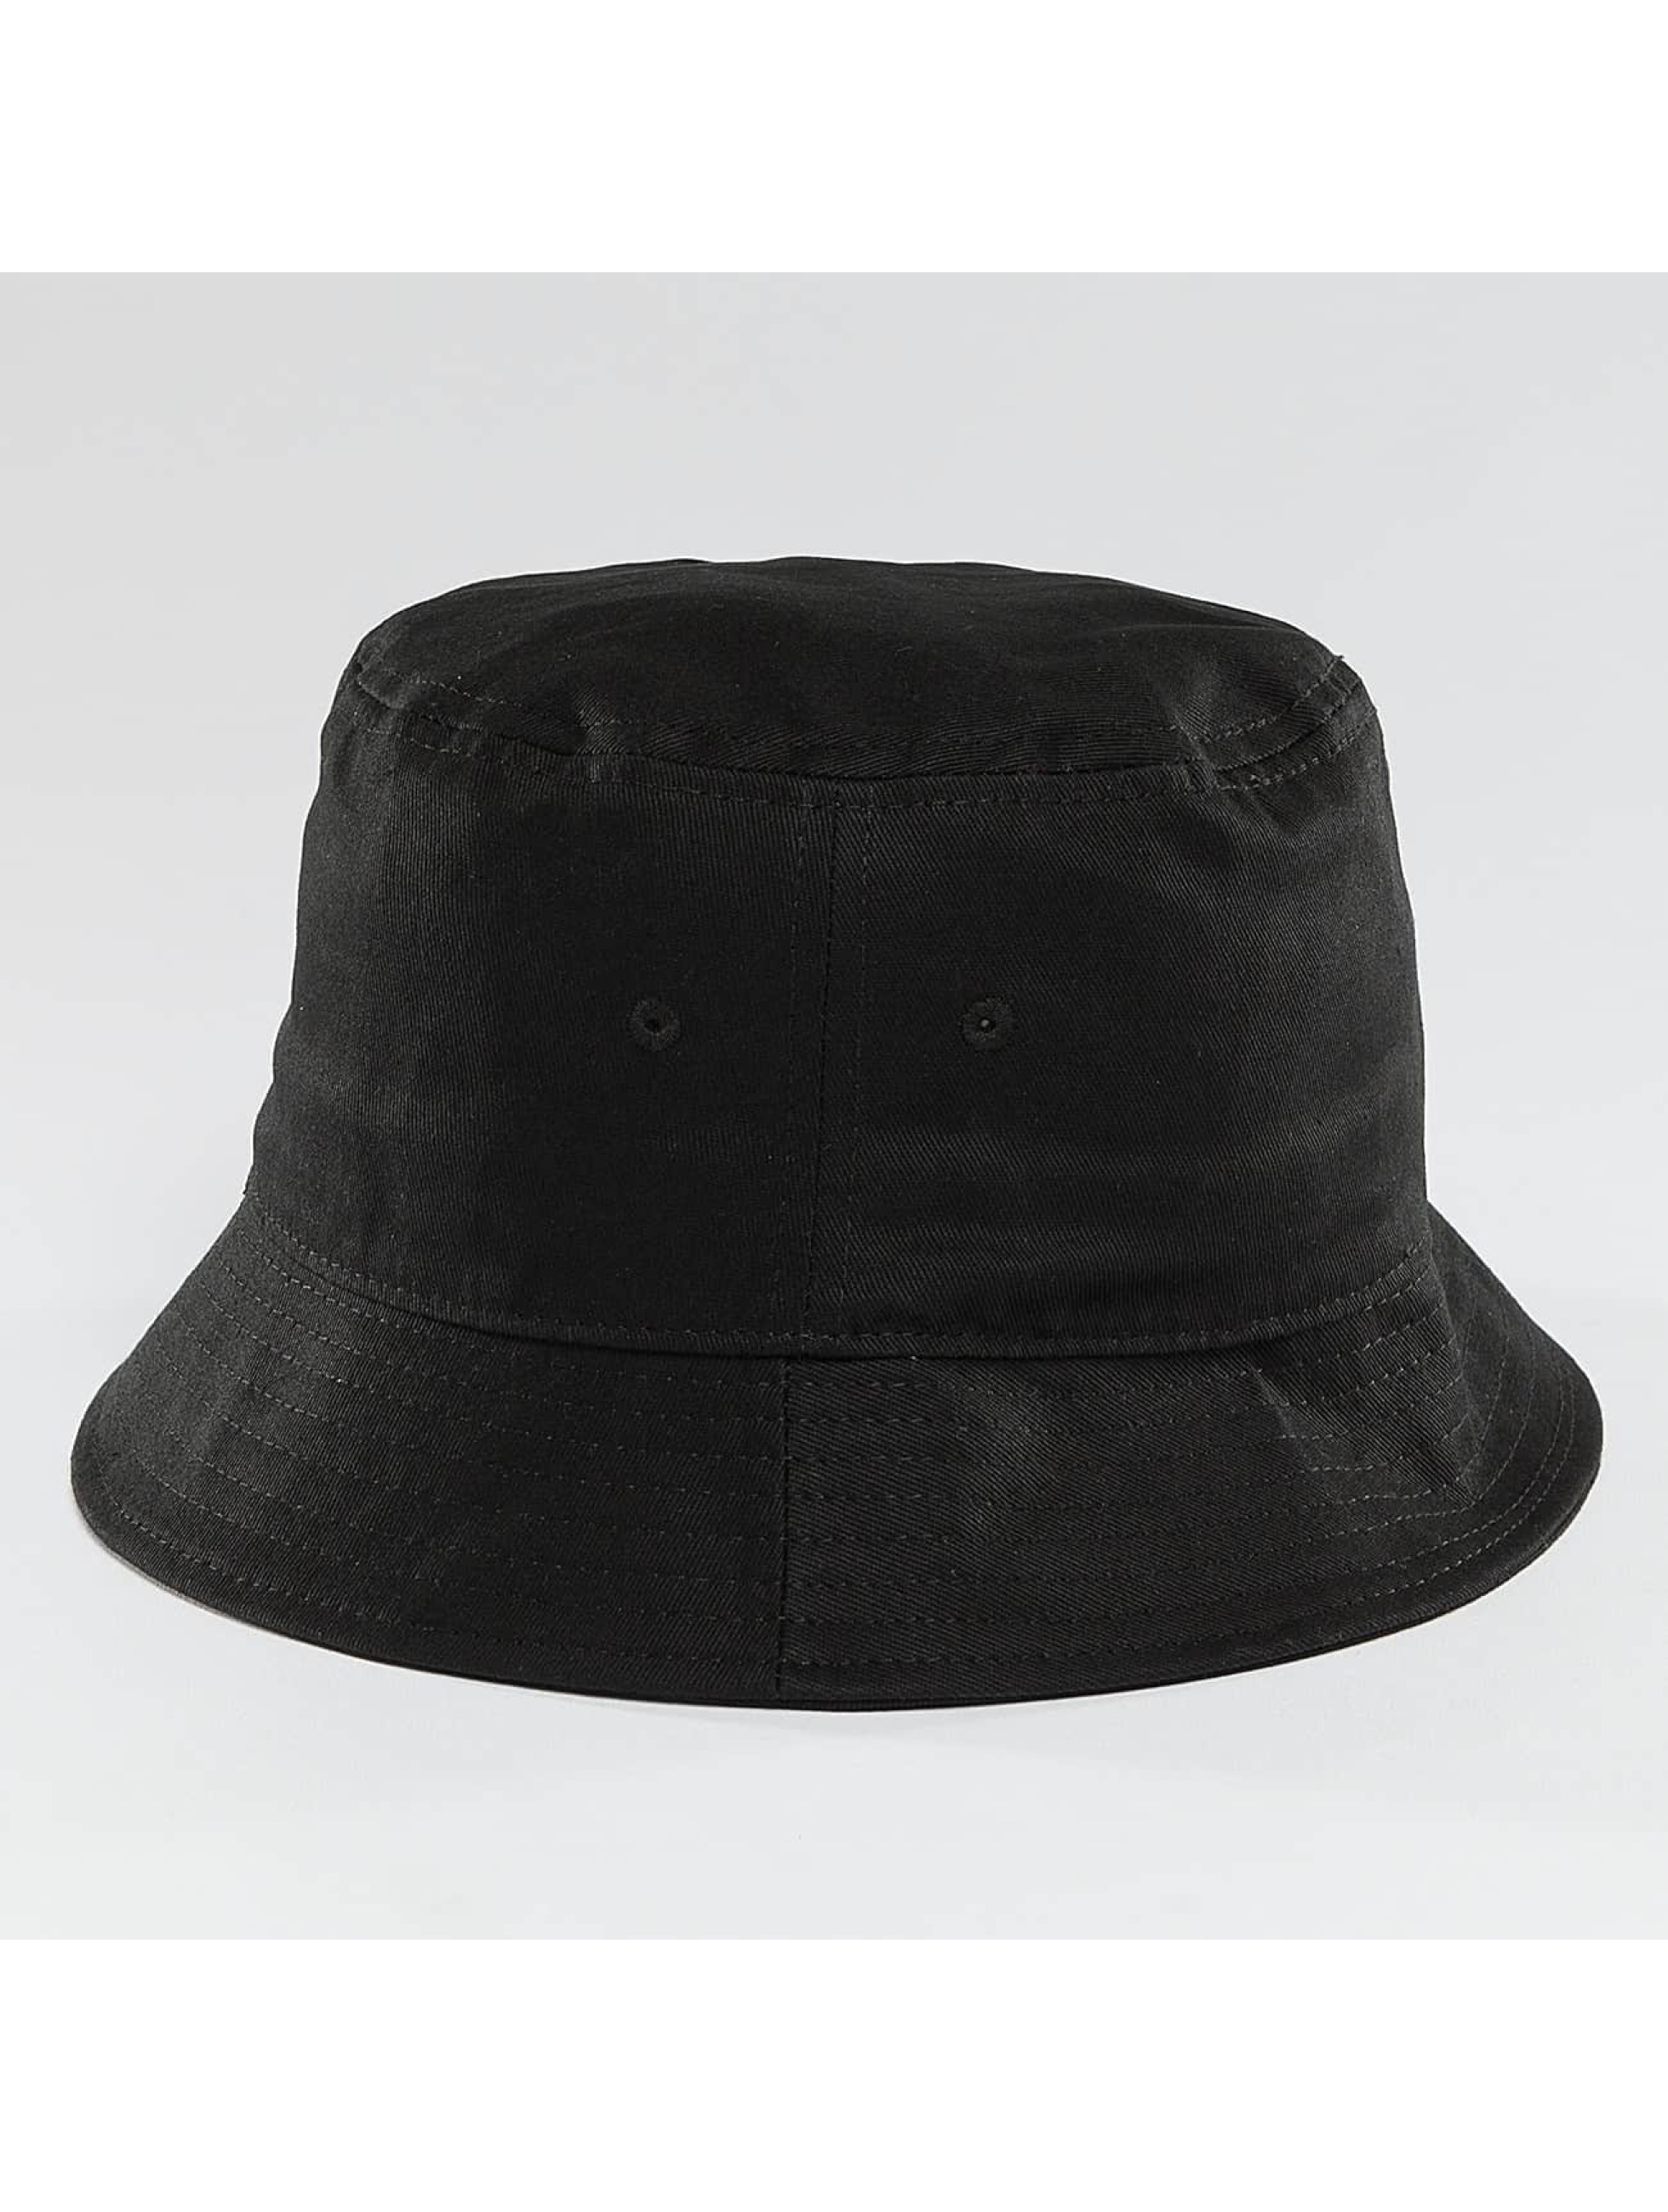 truespin blank noir homme chapeau truespin acheter pas cher accessoires 393562. Black Bedroom Furniture Sets. Home Design Ideas